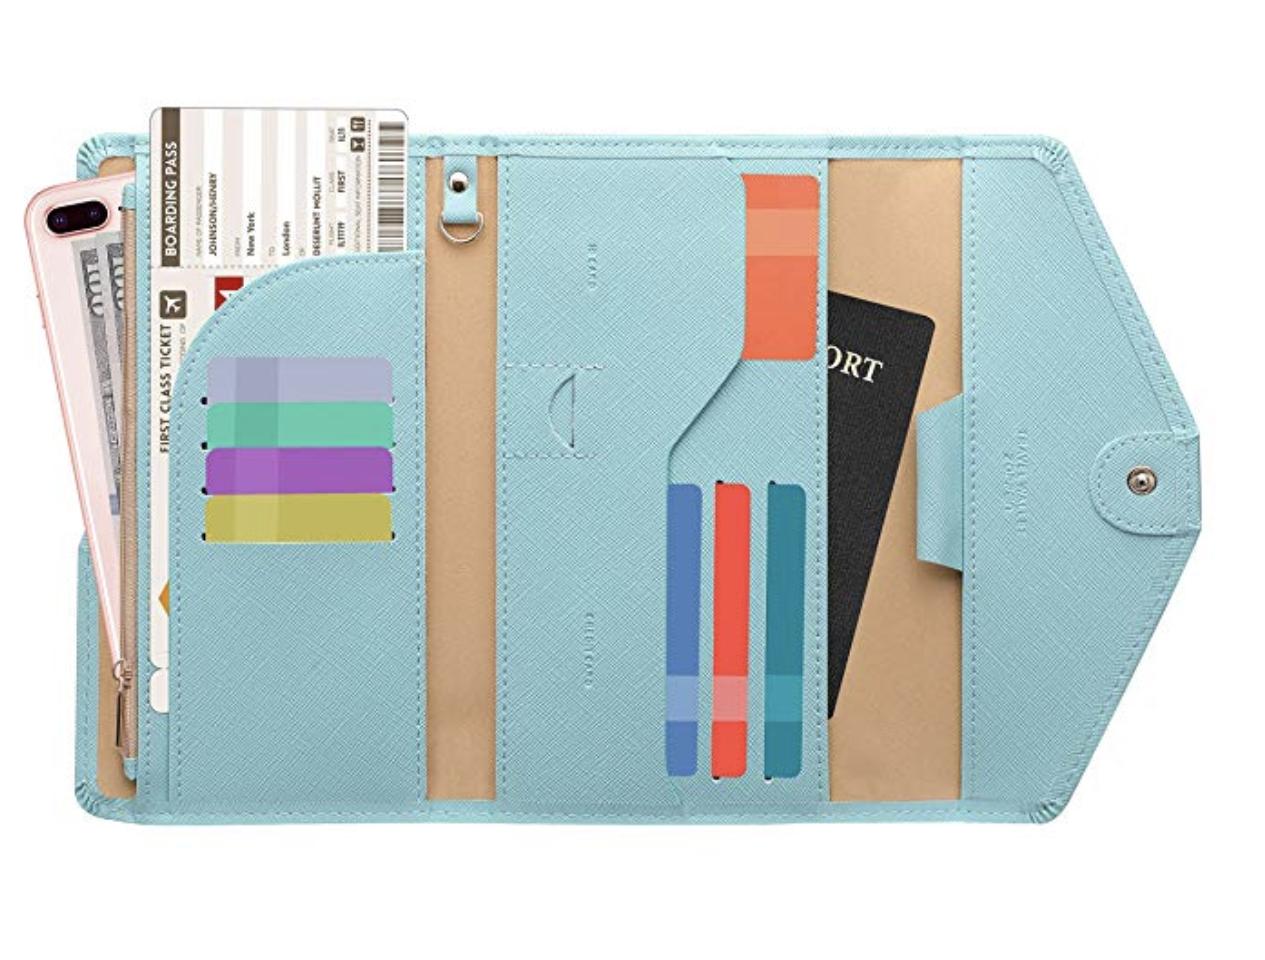 Zoppen Multi-Purpose Travel Passport Wallet and Document Organizer